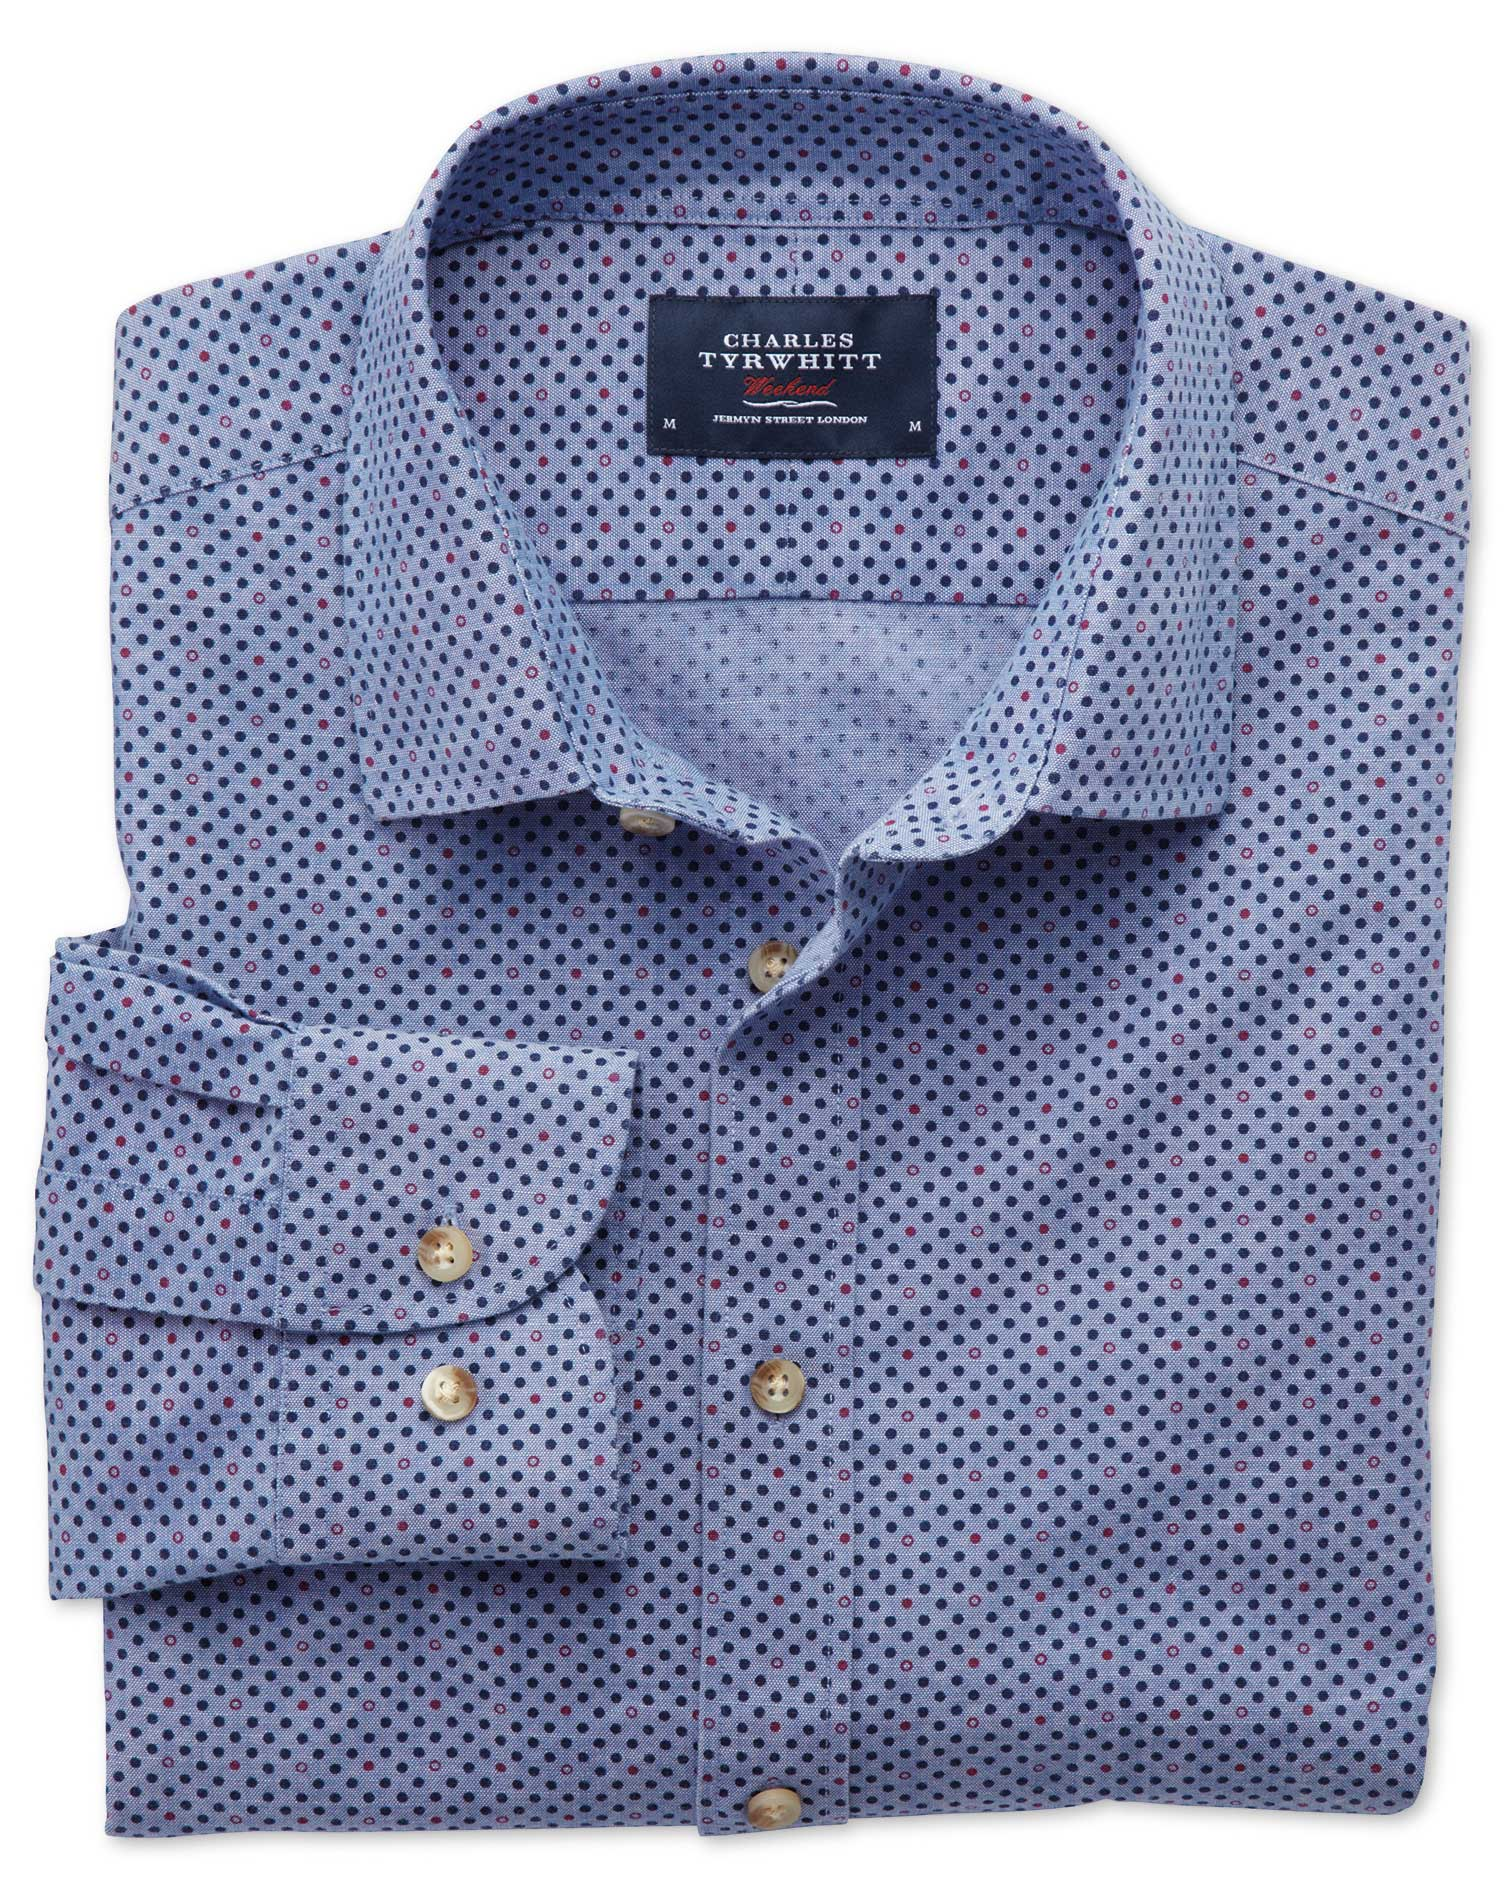 Extra Slim Fit Blue And Purple Spot Print Shirt Charles